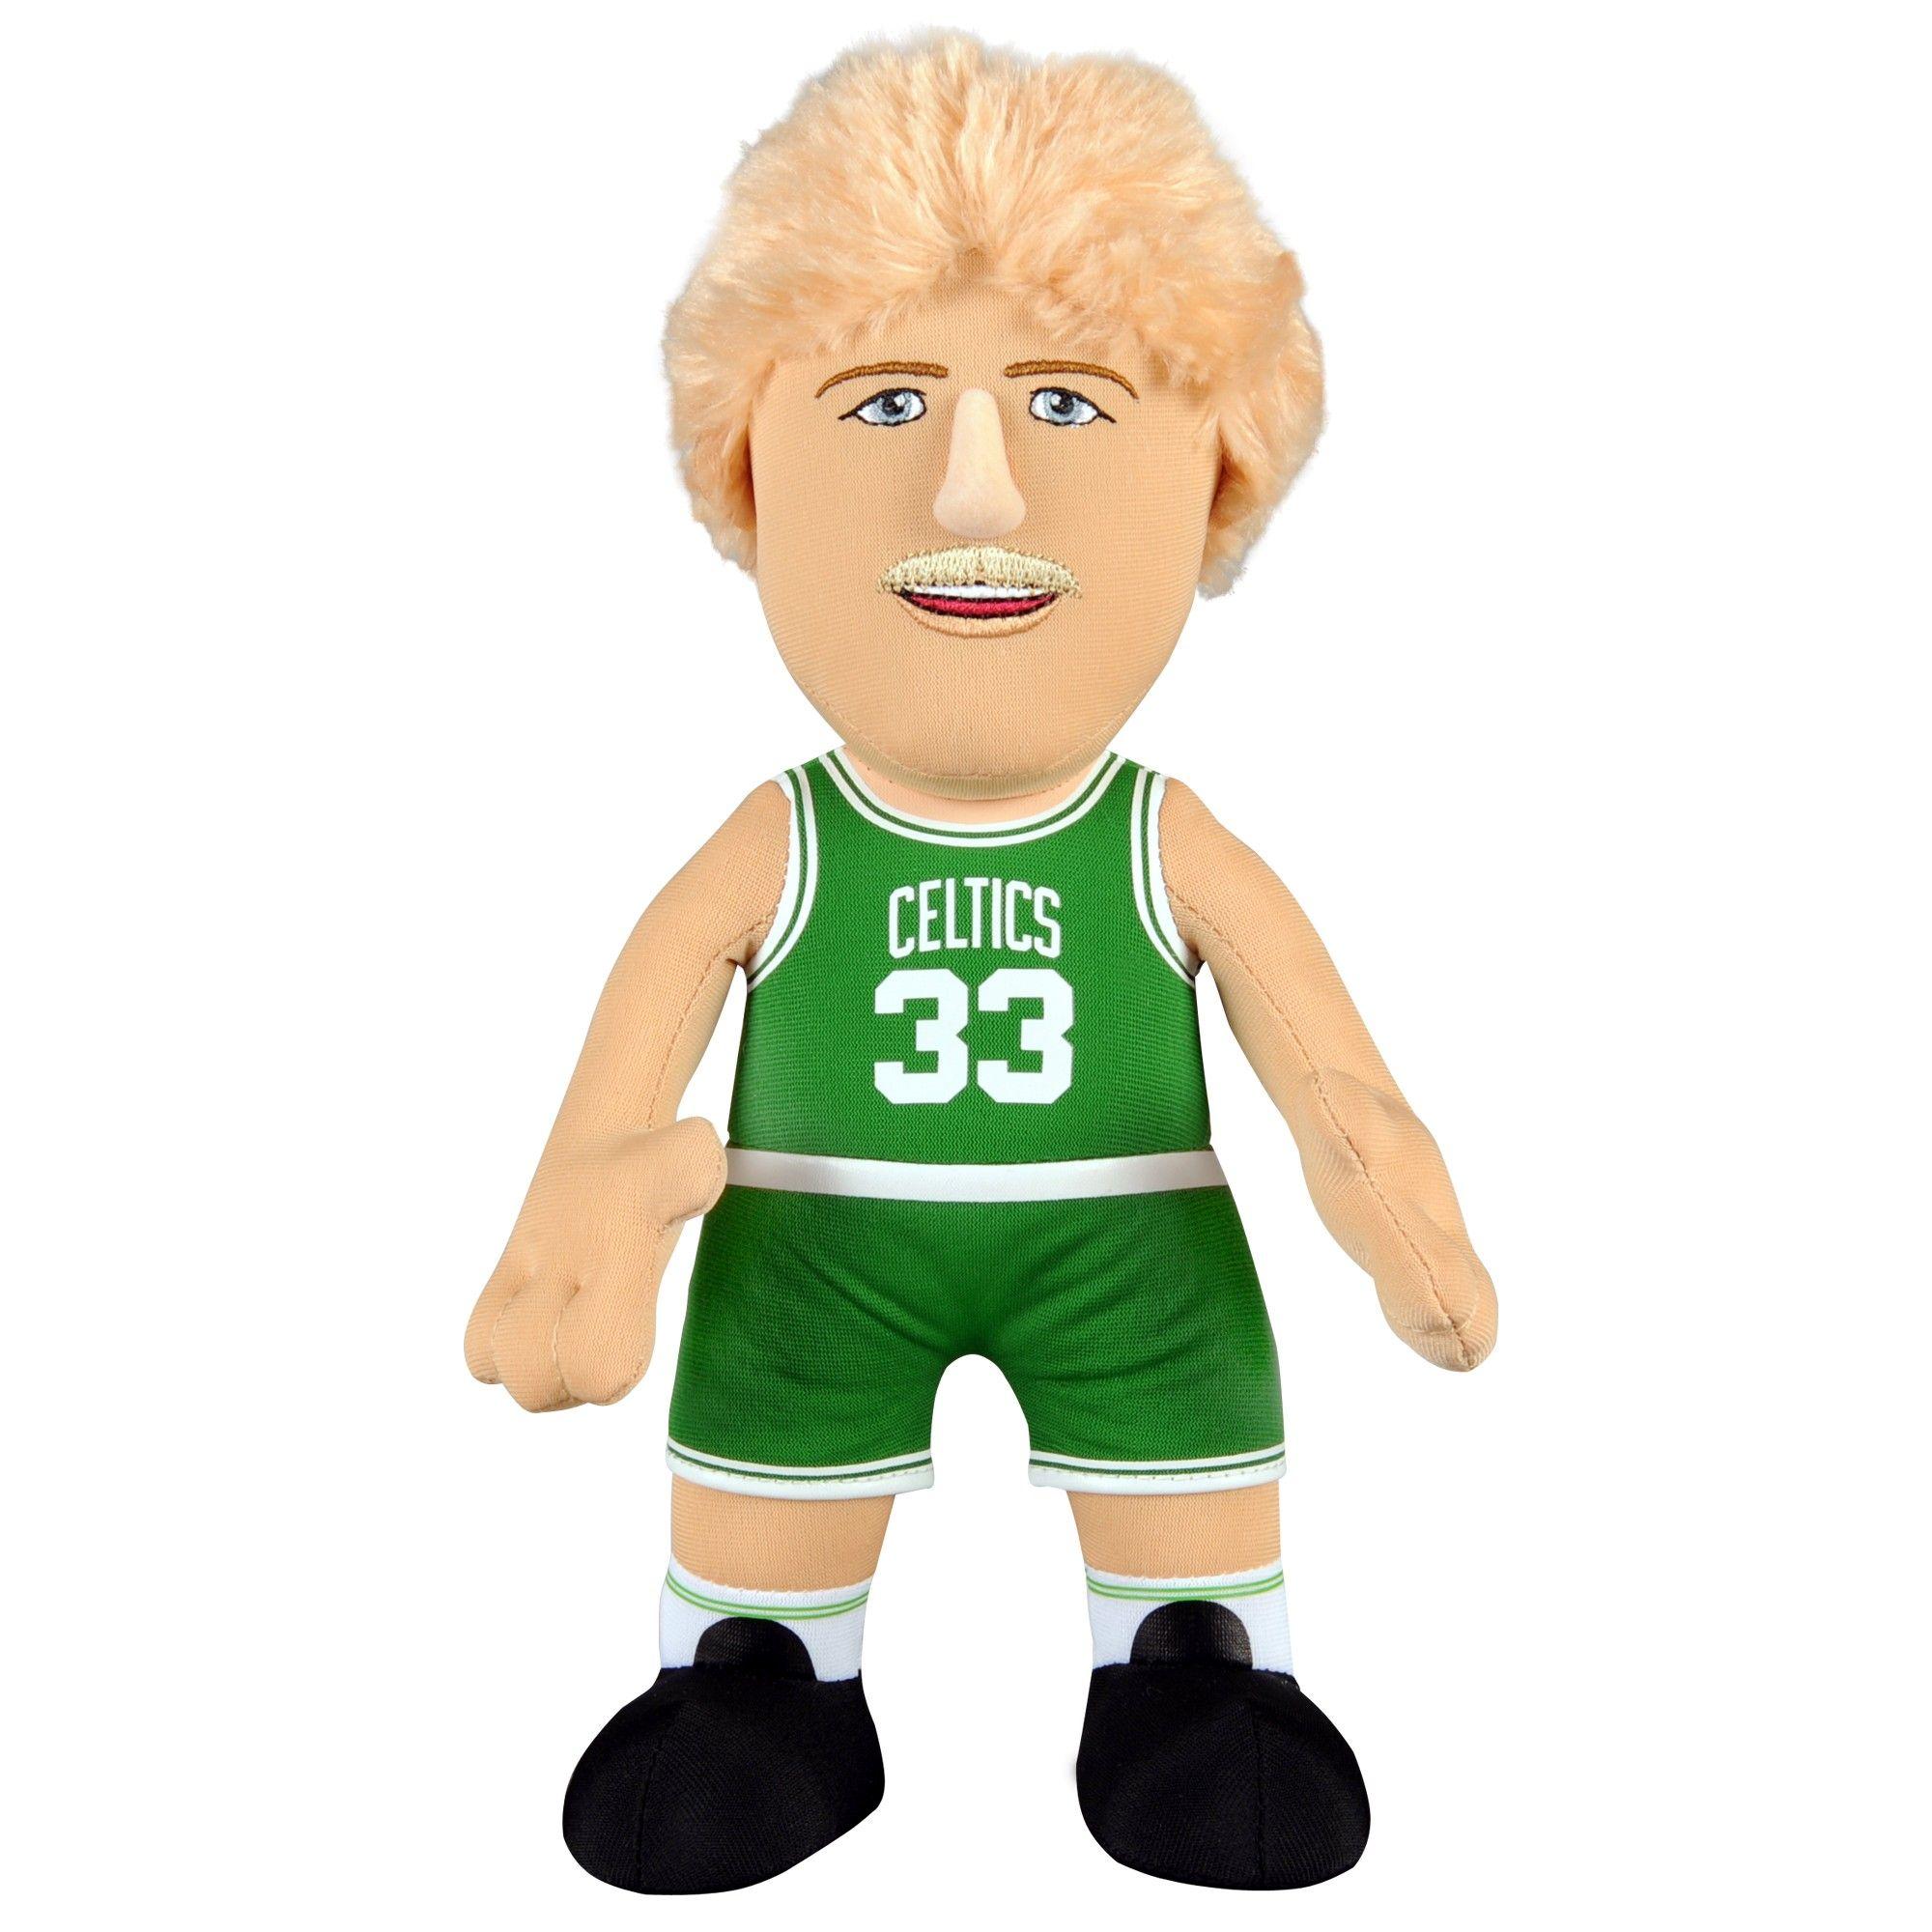 Magic Johnson Dynamic Duo Bundle Usa Basketball And Los Angeles Lakers 10 Plush Figures Larry Bird Boston Celtics Celtics Gear